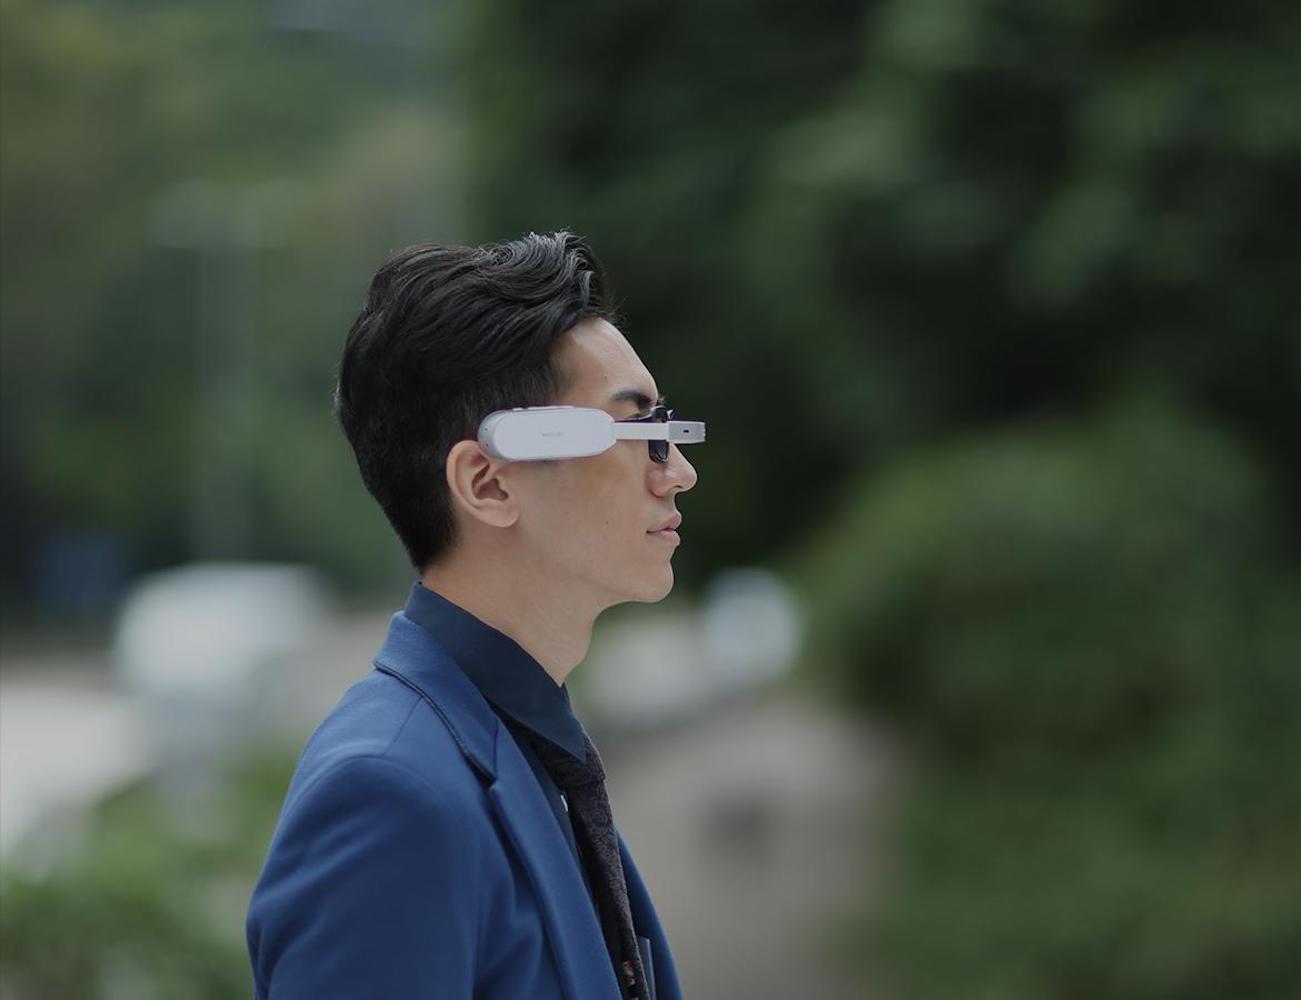 MAD Glass – Smart Eyewear Made For Everyone